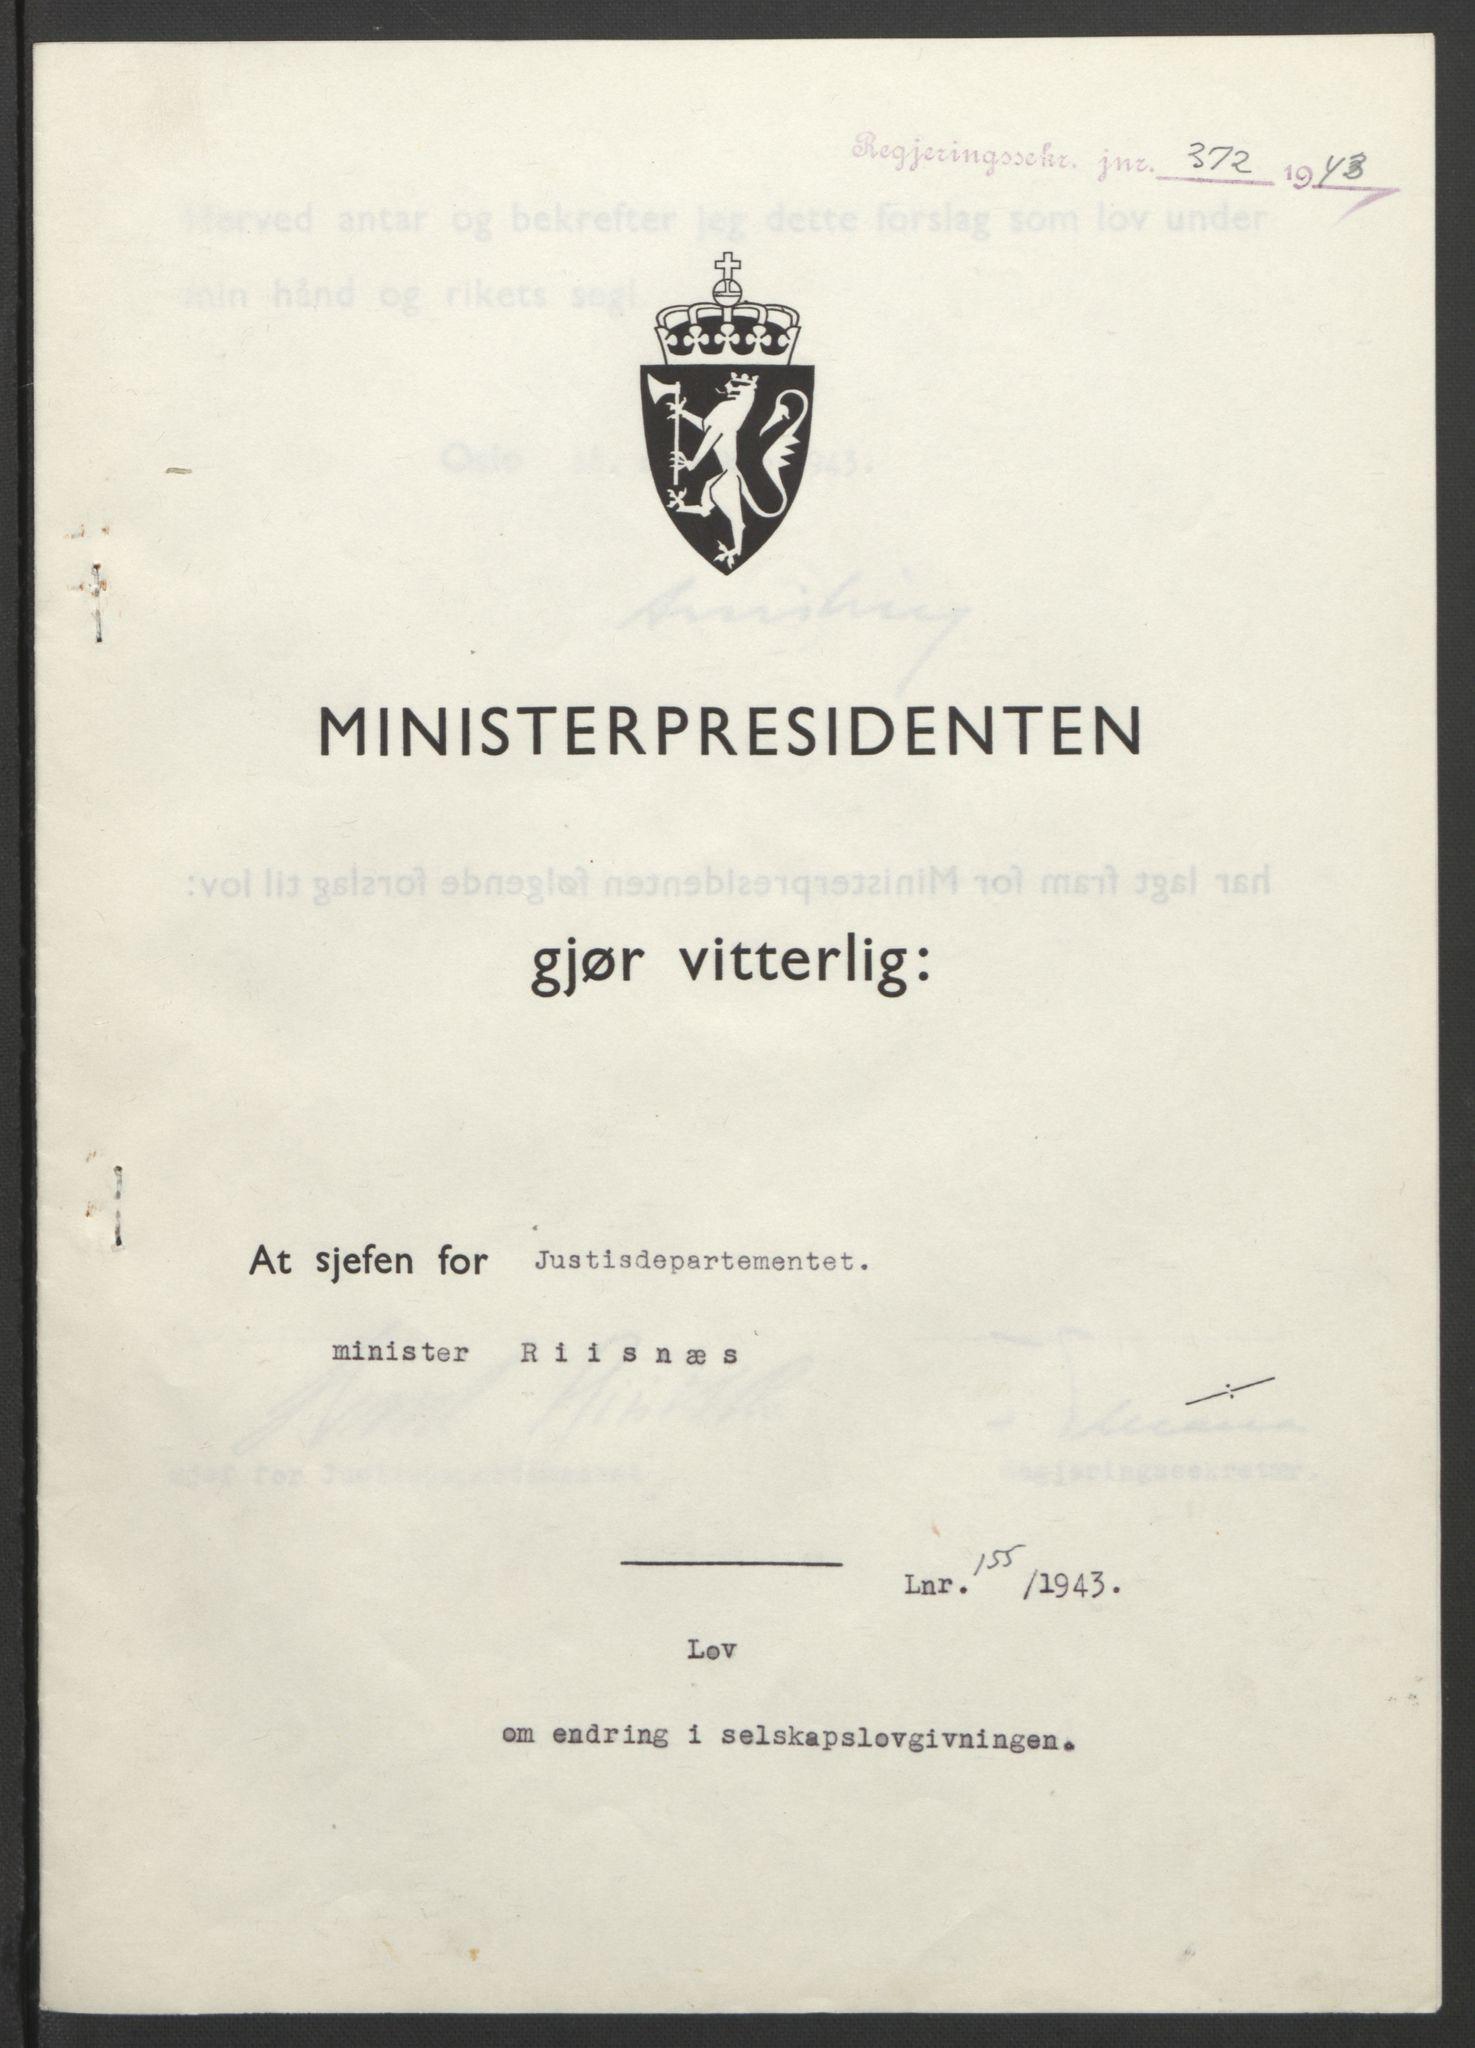 RA, NS-administrasjonen 1940-1945 (Statsrådsekretariatet, de kommisariske statsråder mm), D/Db/L0099: Lover, 1943, s. 735